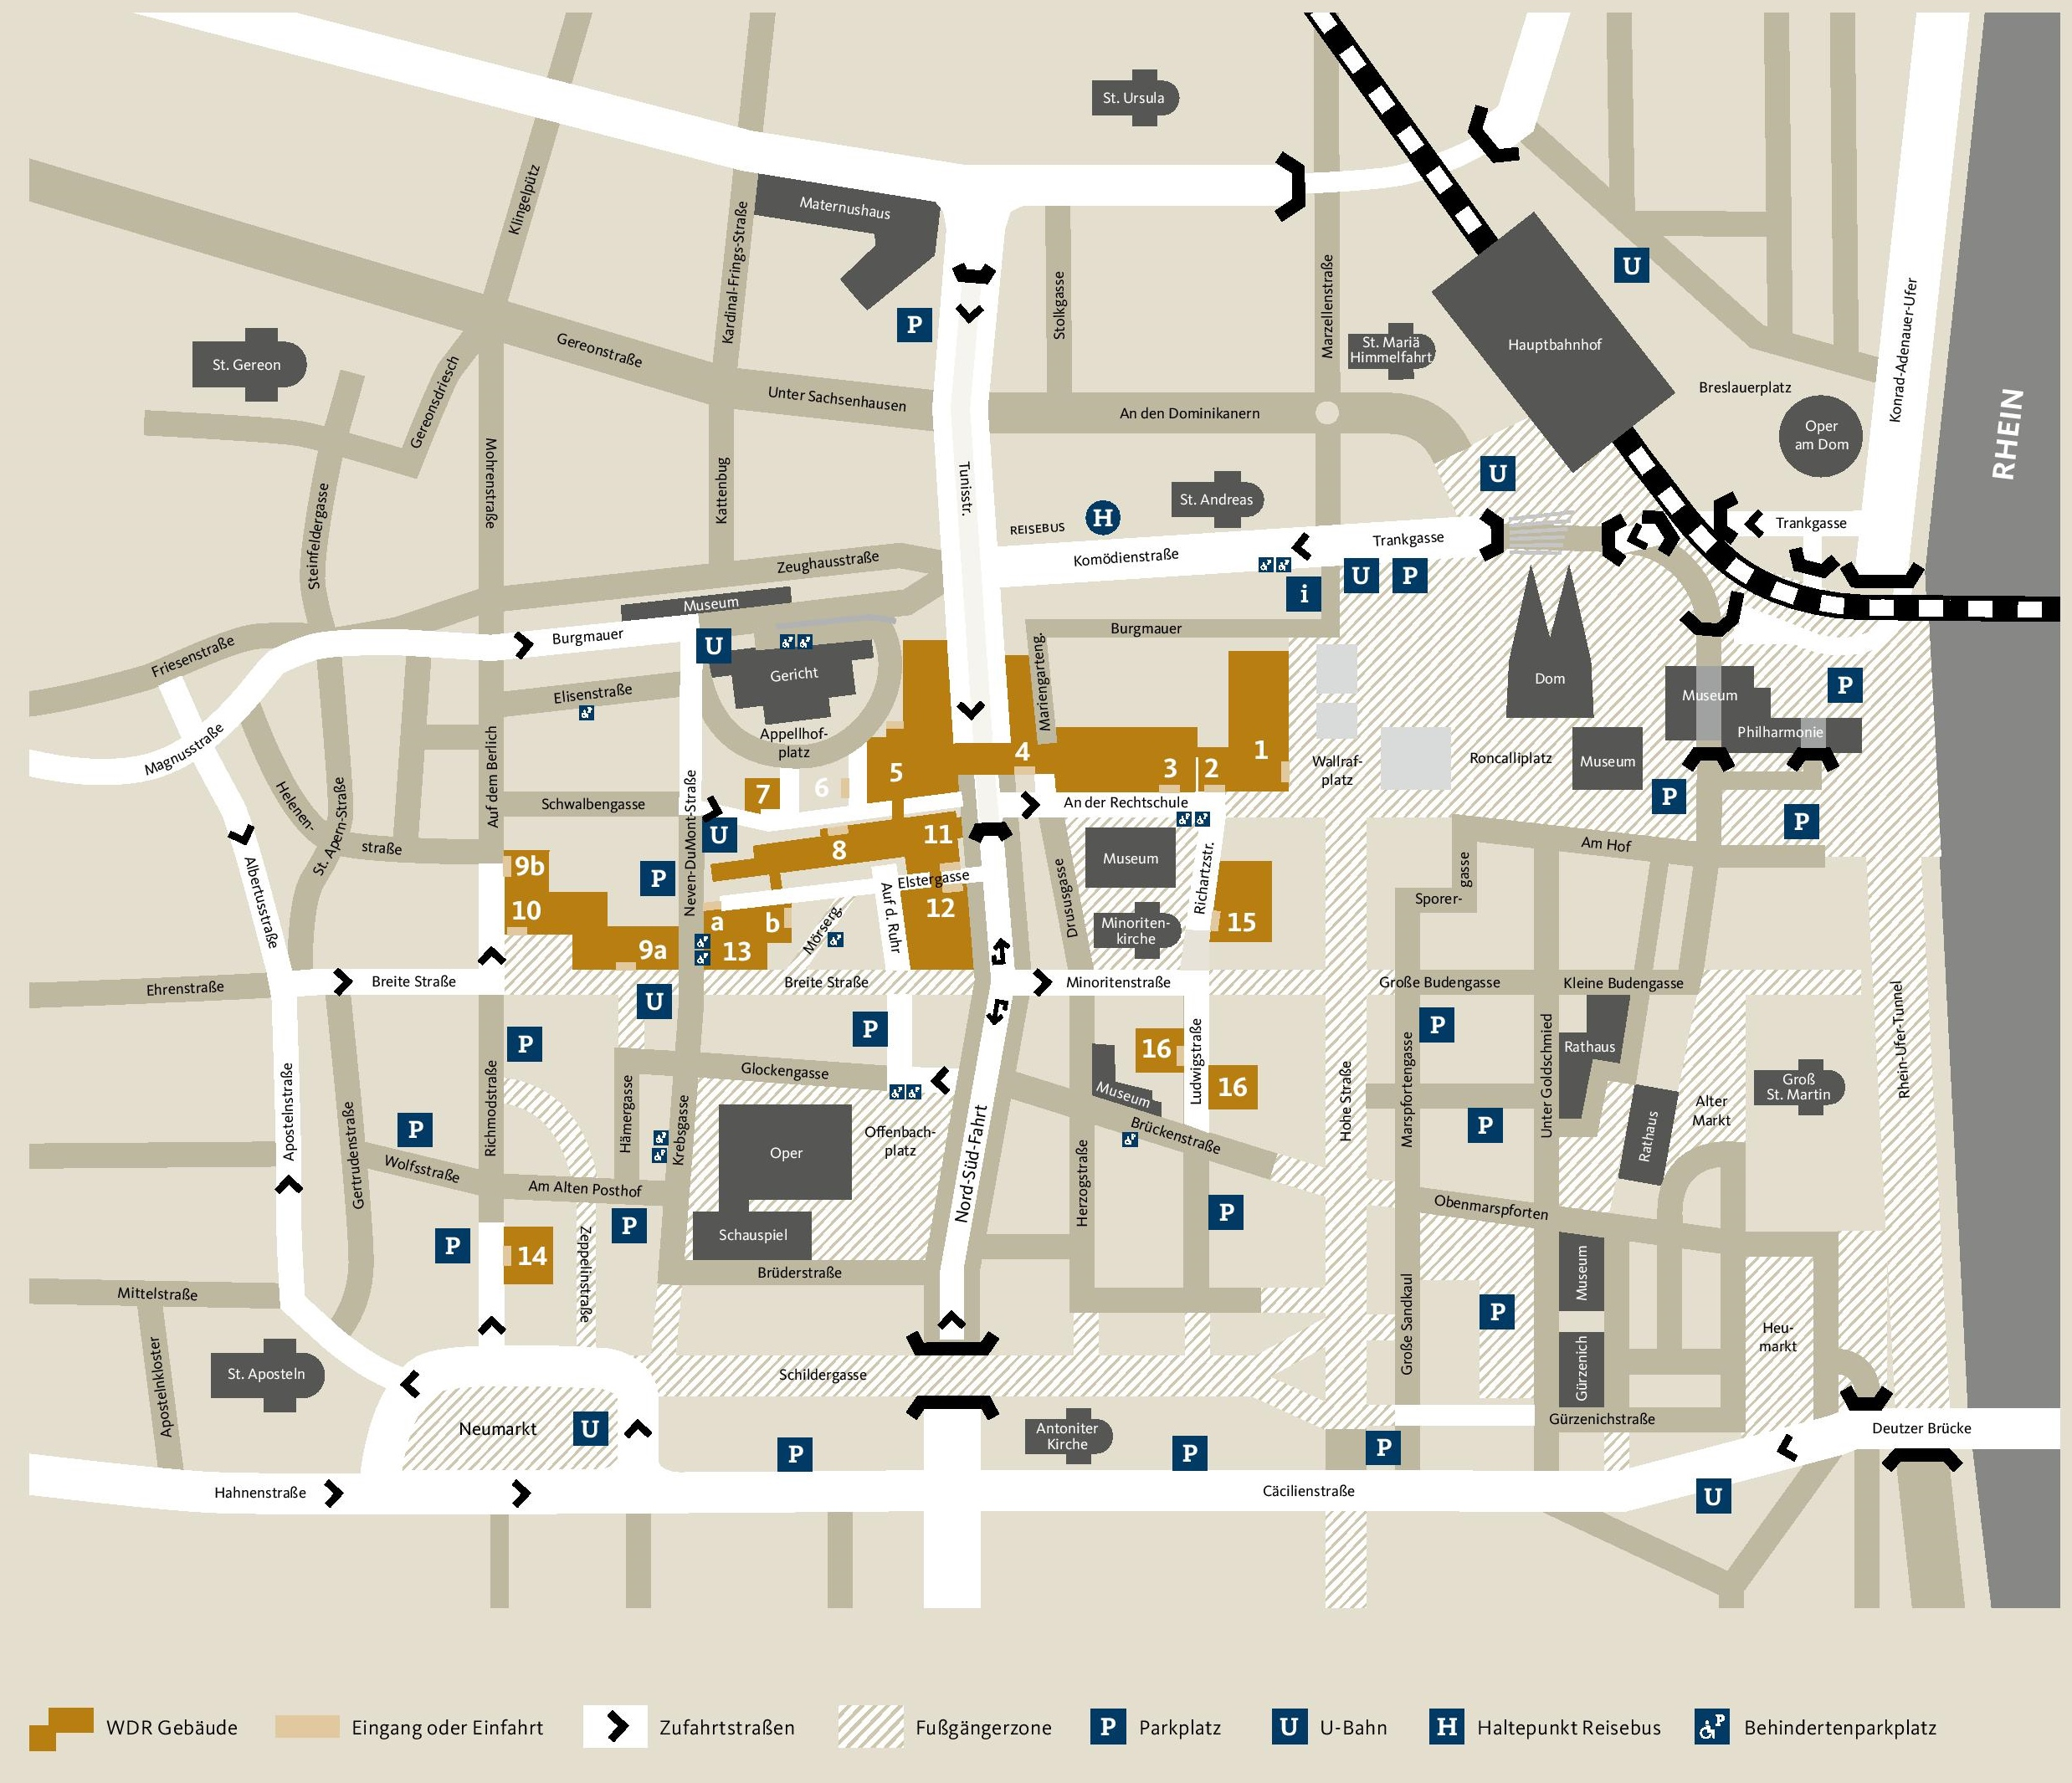 Stadtplan mit Sehenswürdigkeiten · City map with major attractions